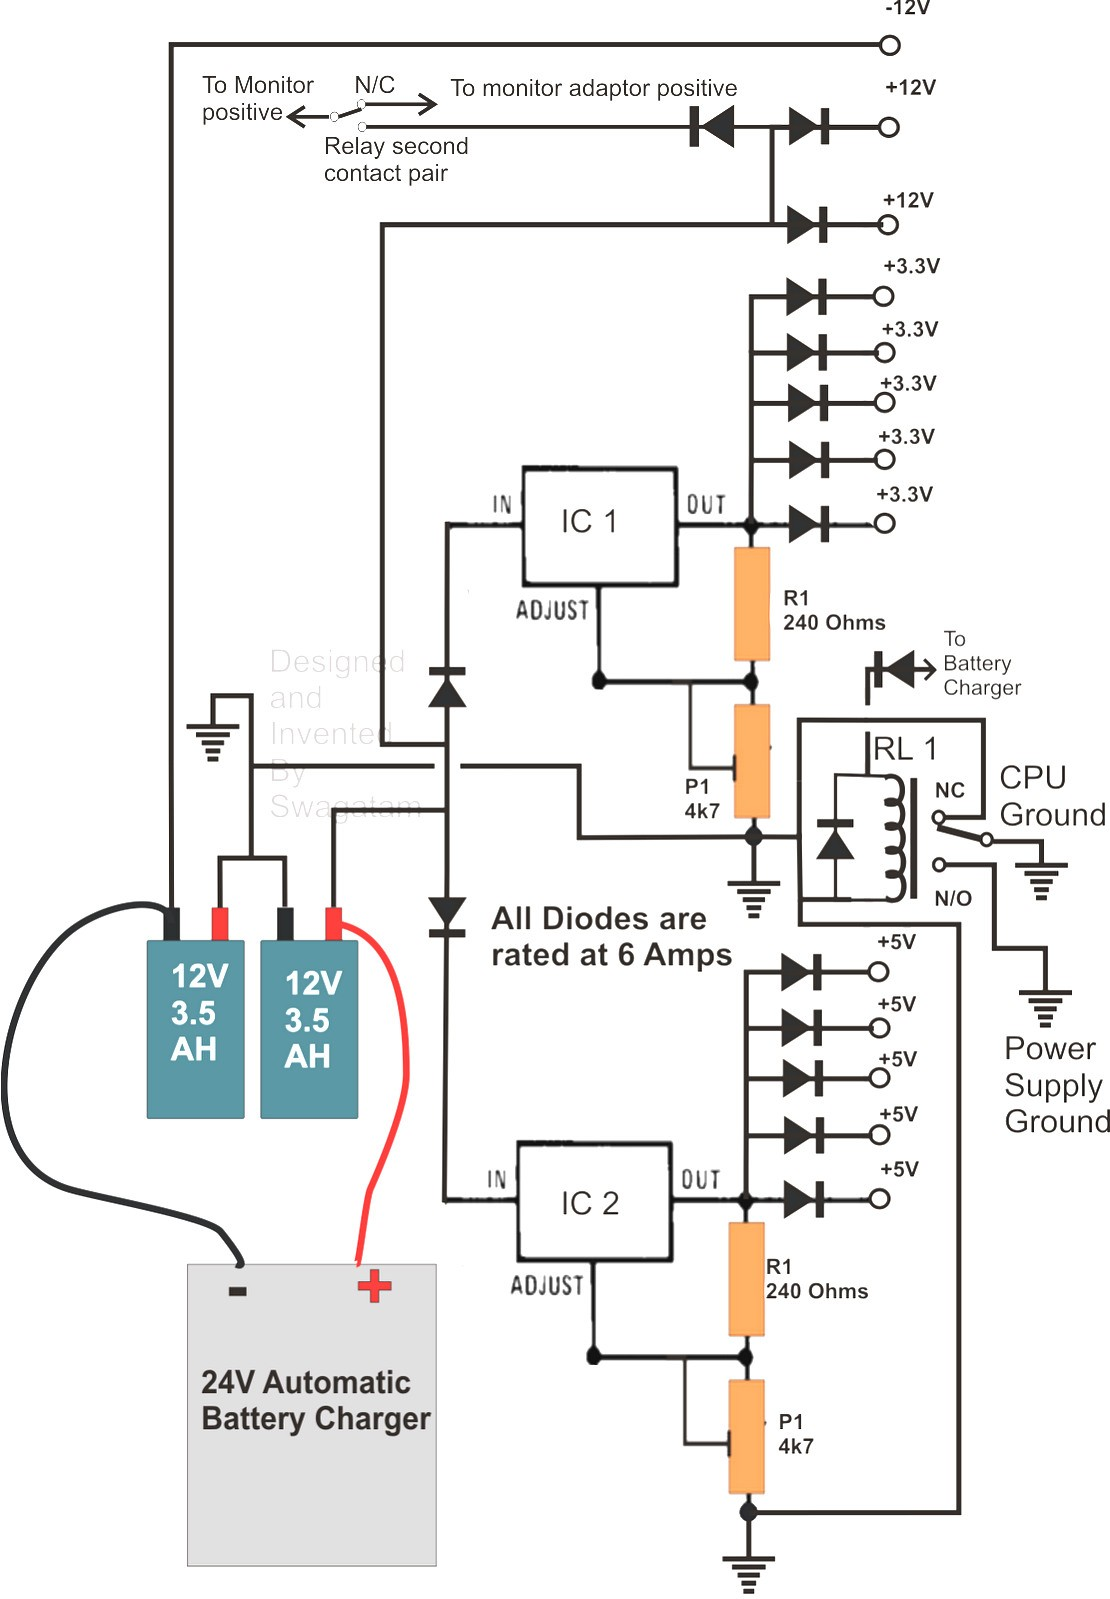 hight resolution of saab sonett wiring diagram images gallery